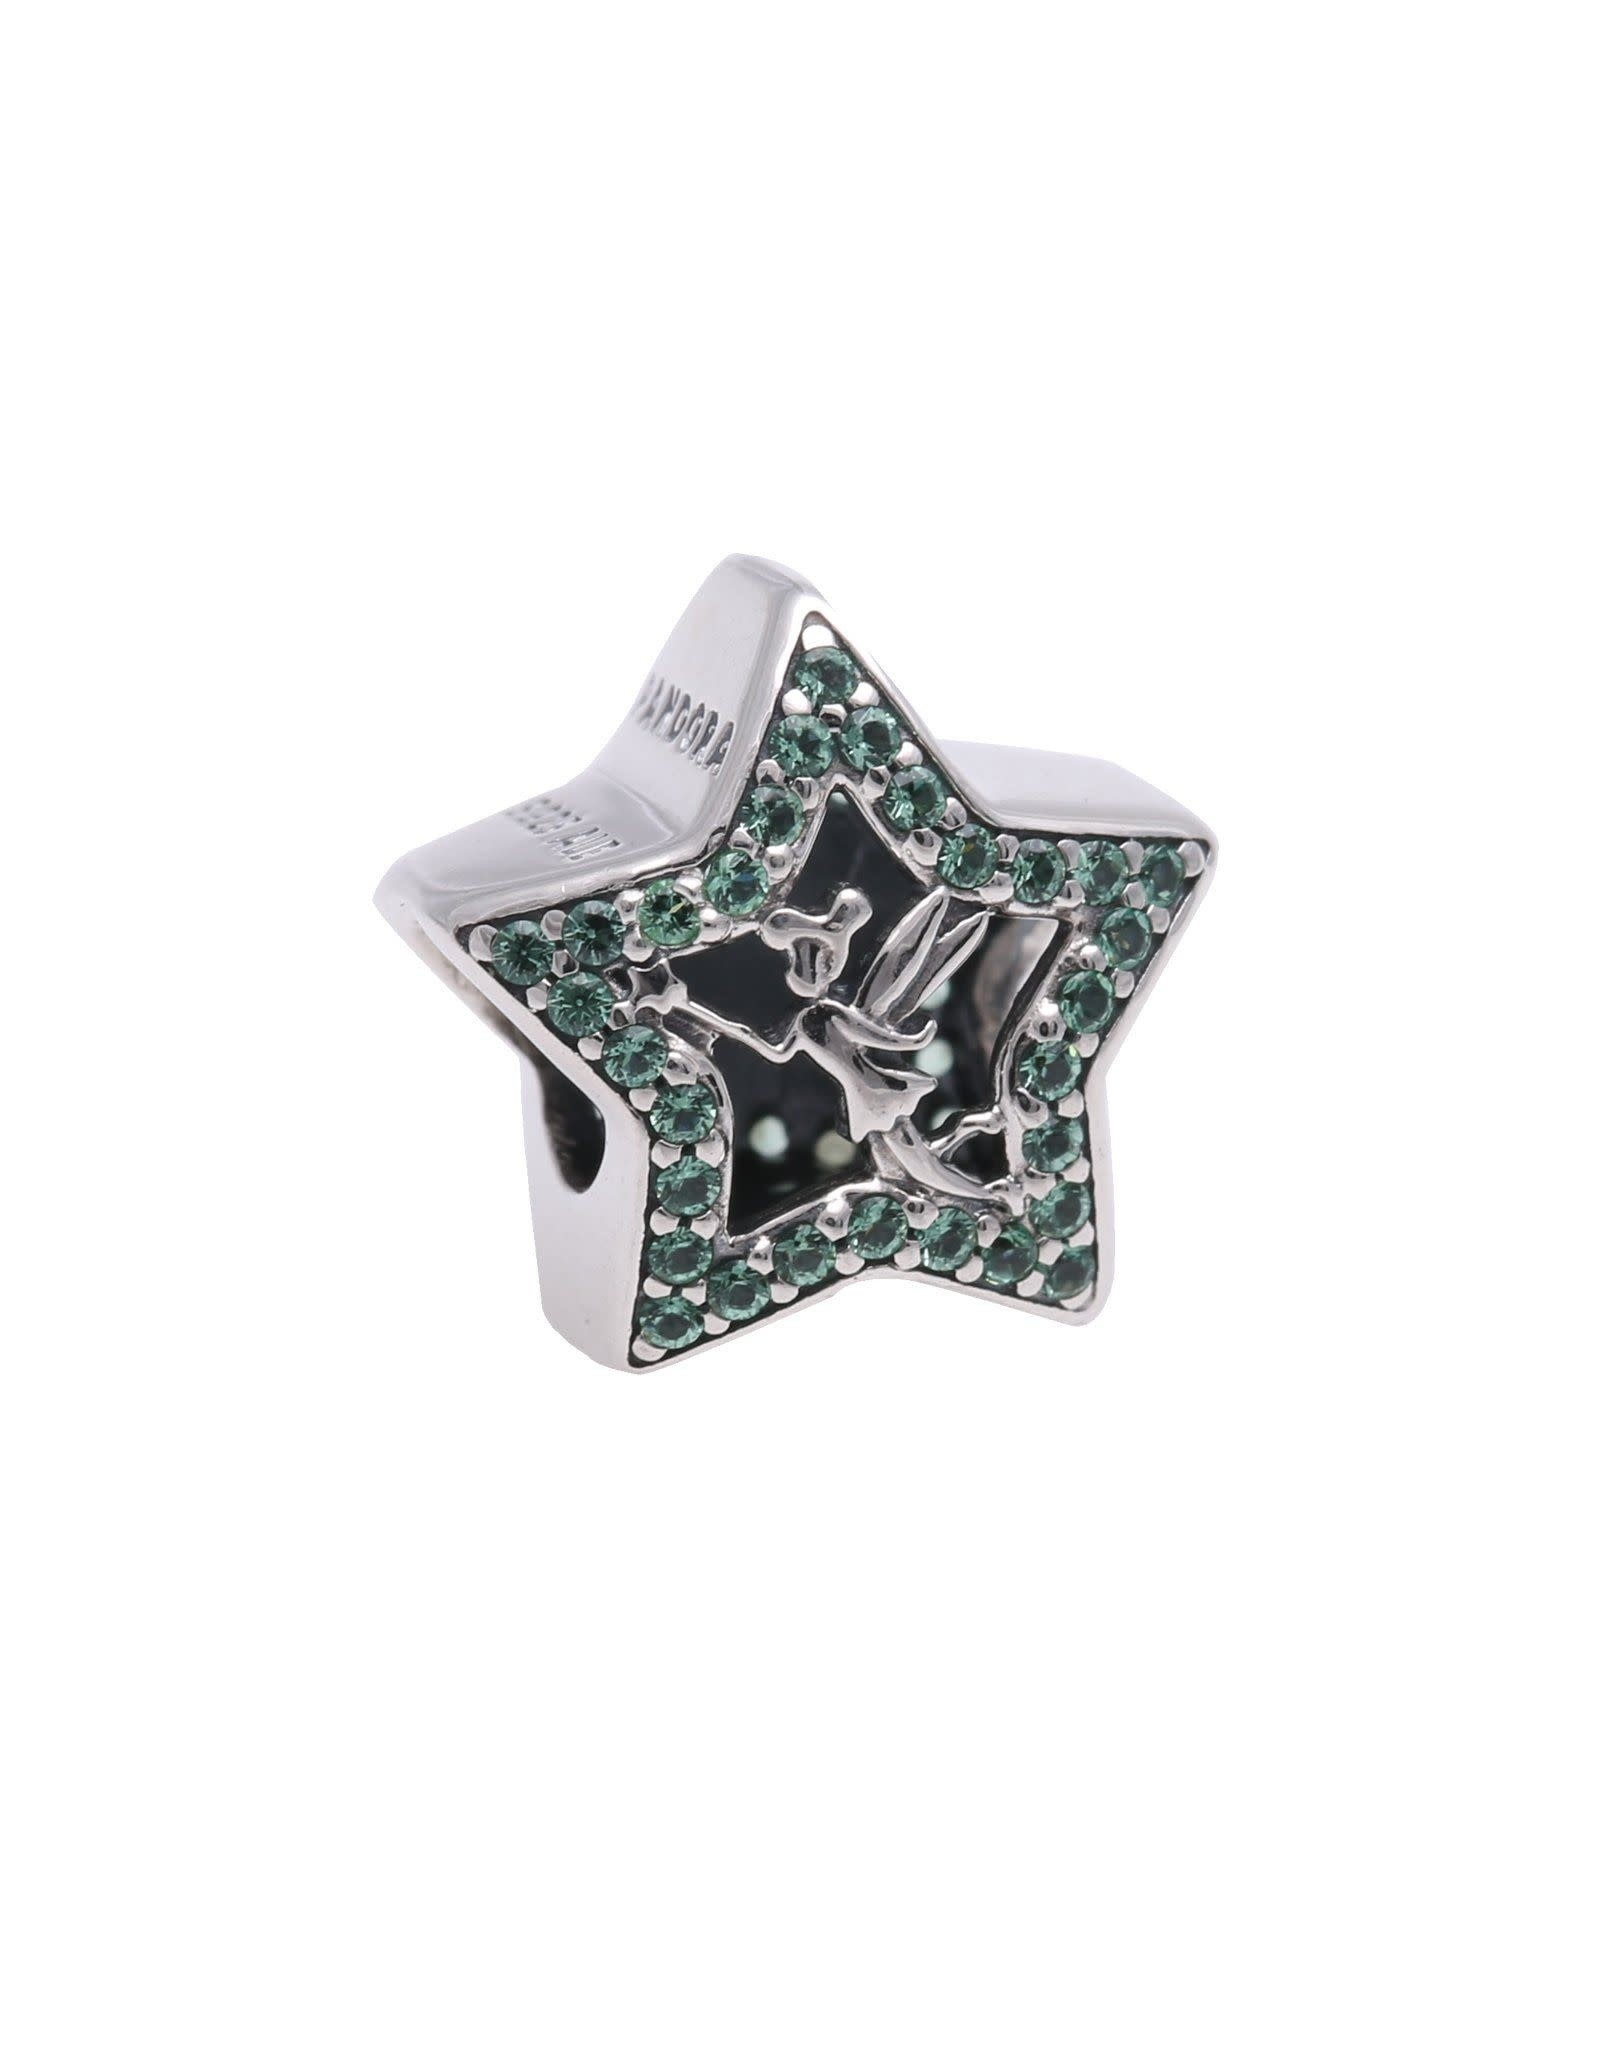 Pandora Pandora Charm,Disney Tinker Bell Star, Pale Green Crystals